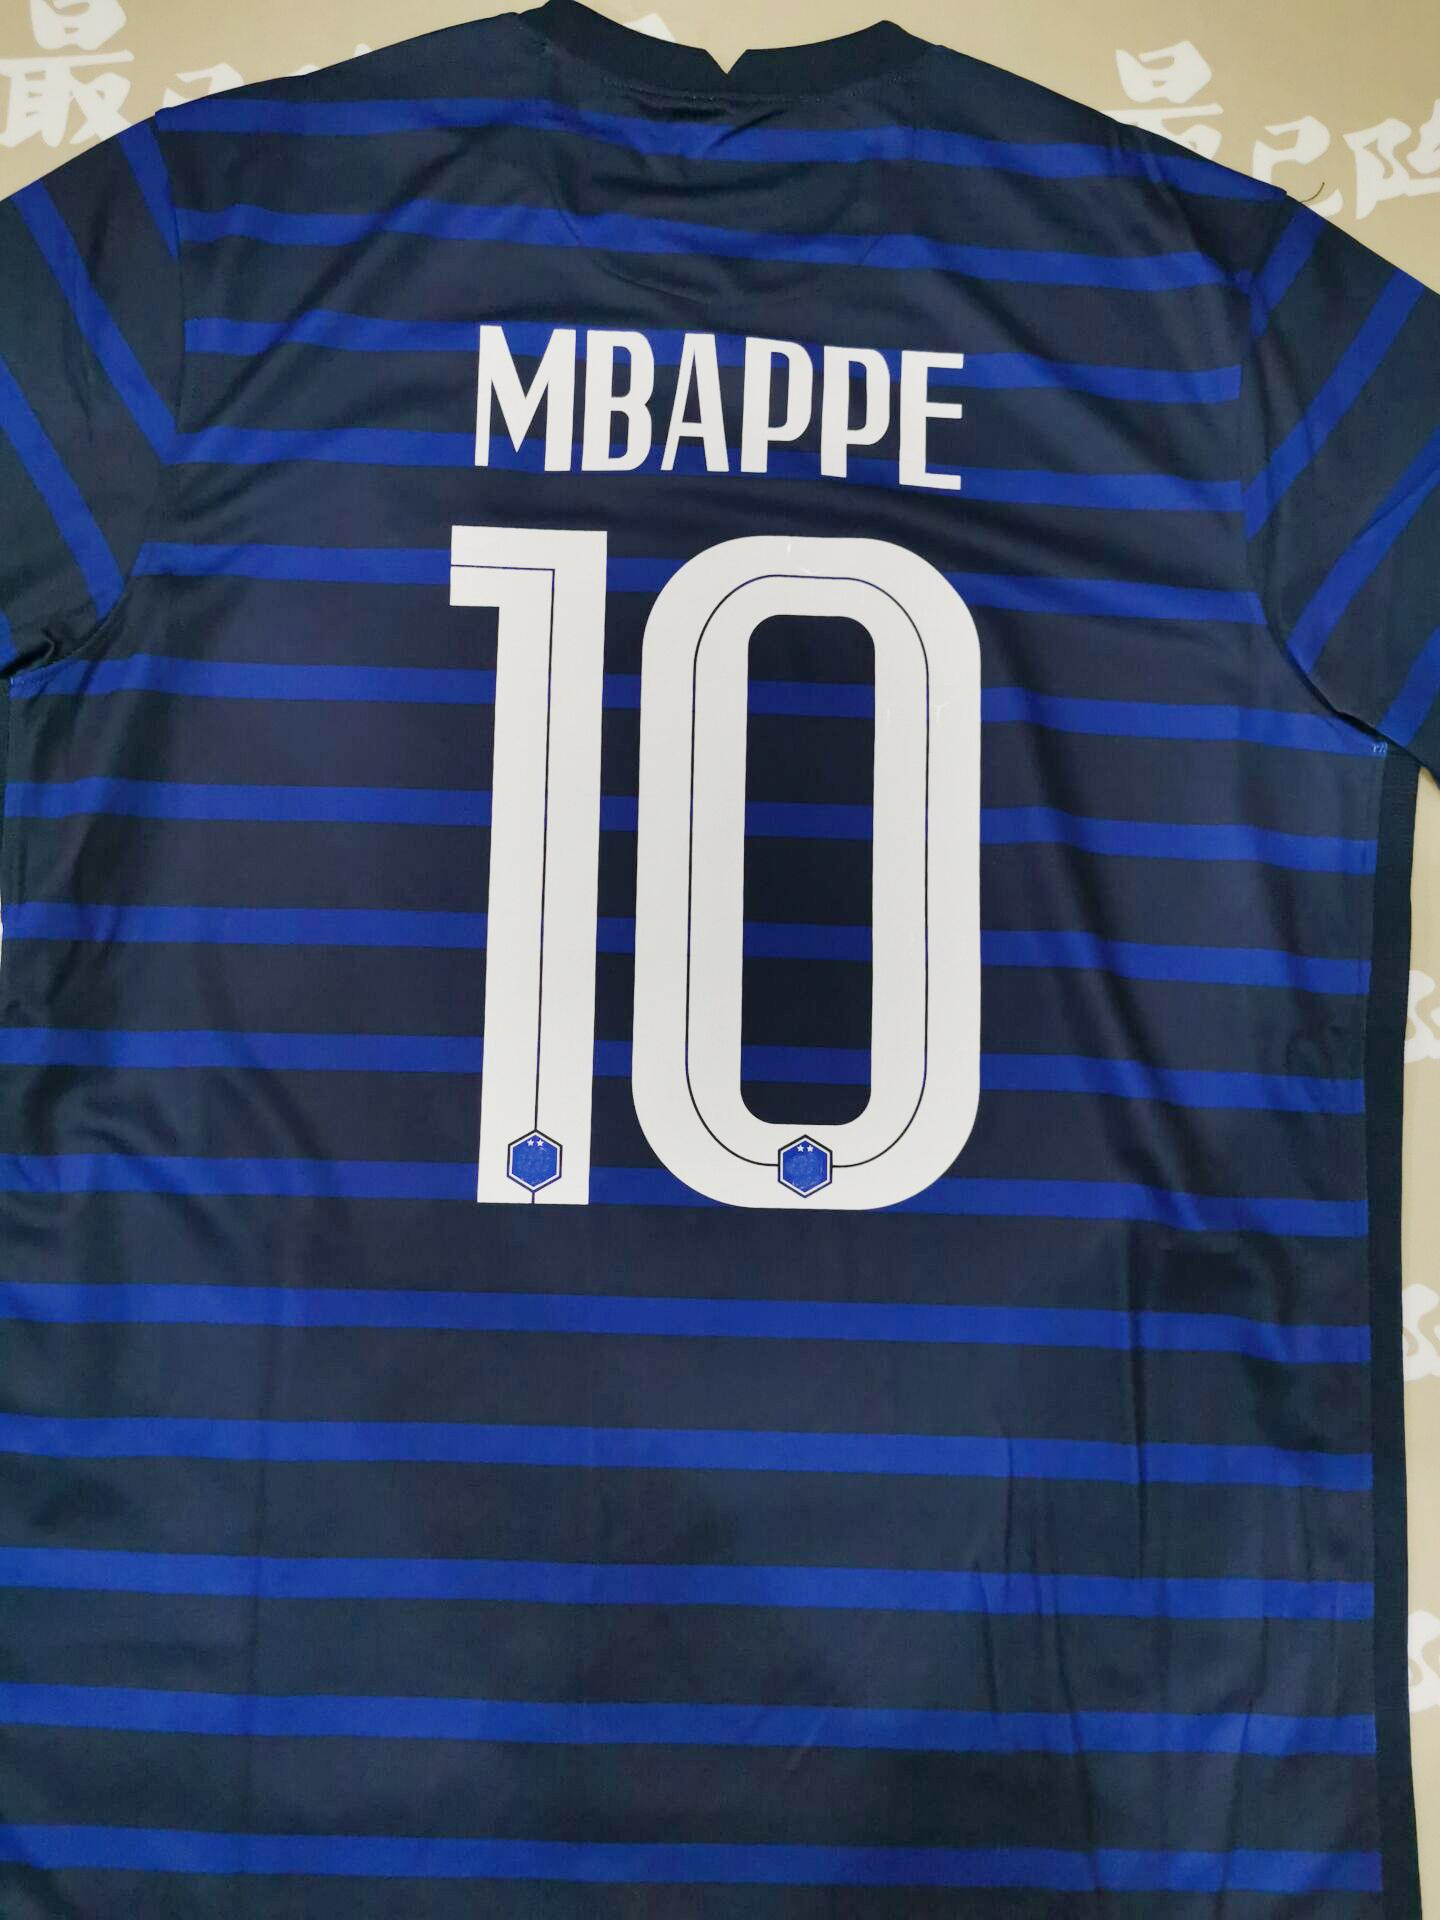 # 10 Mbappe Nation Team Soccer Jersey # 7 Griezmann # 13 Knate 20/21 Top Thai Quality Home ALUGAR FUTEBOL